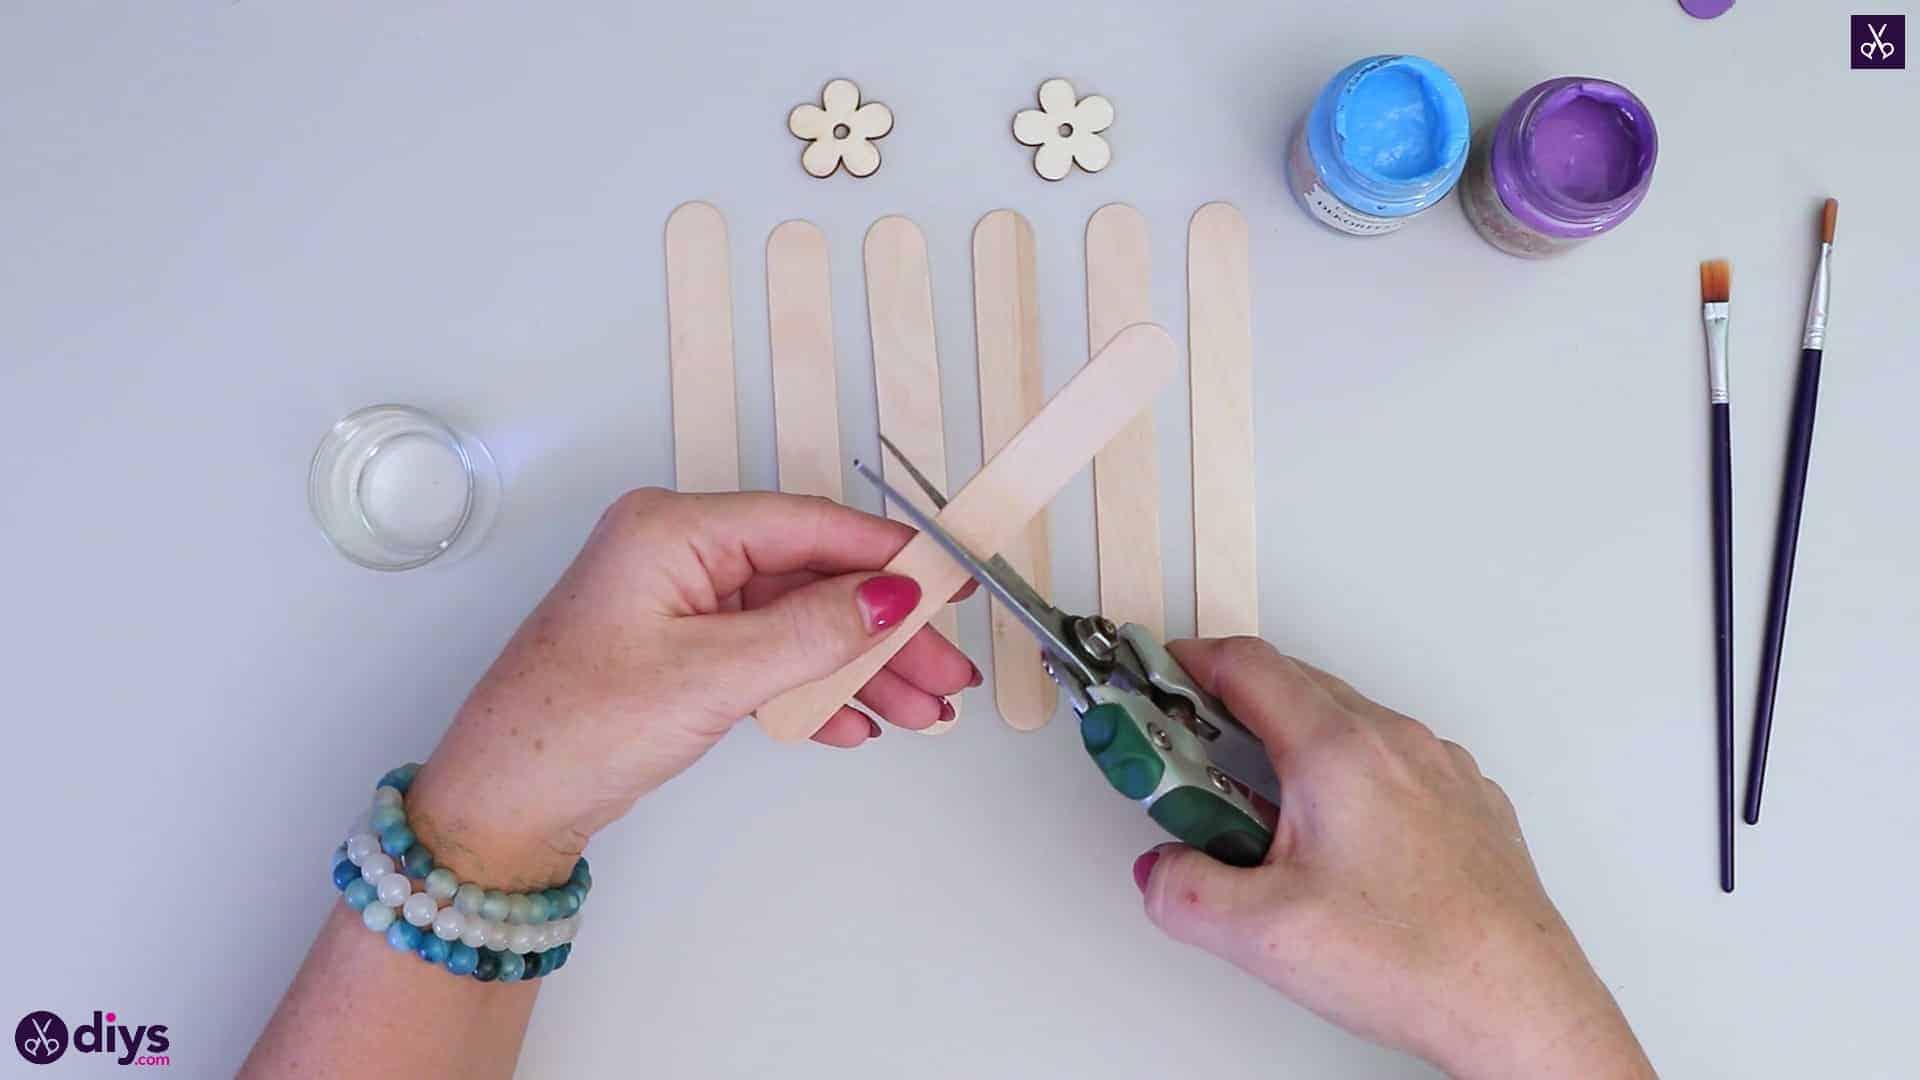 Popsicle stick napkin holder cutting